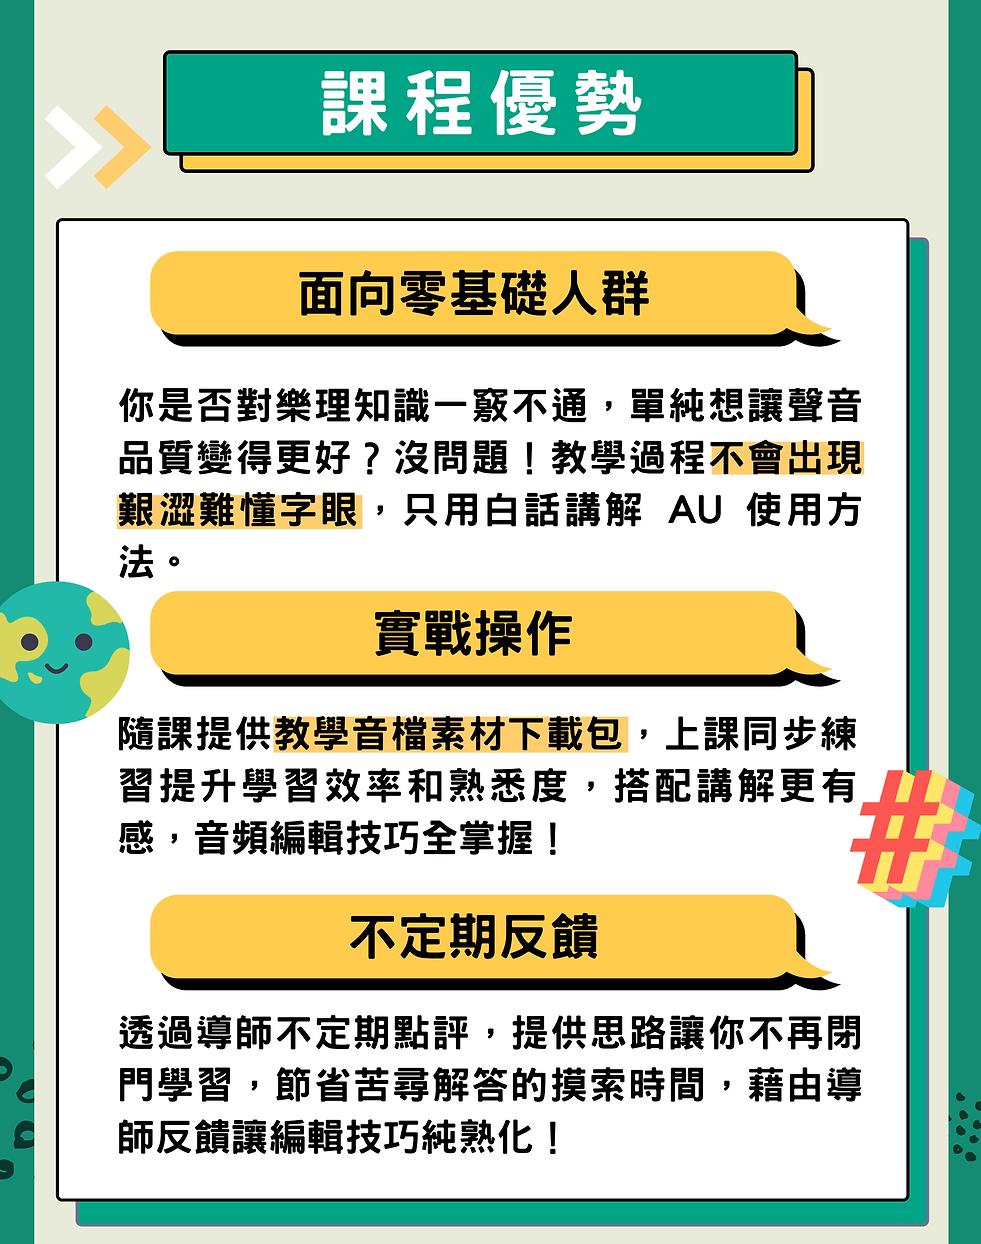 (N) 手機板- (4) 課程優勢 - AU 新手攻略課程 (1).png